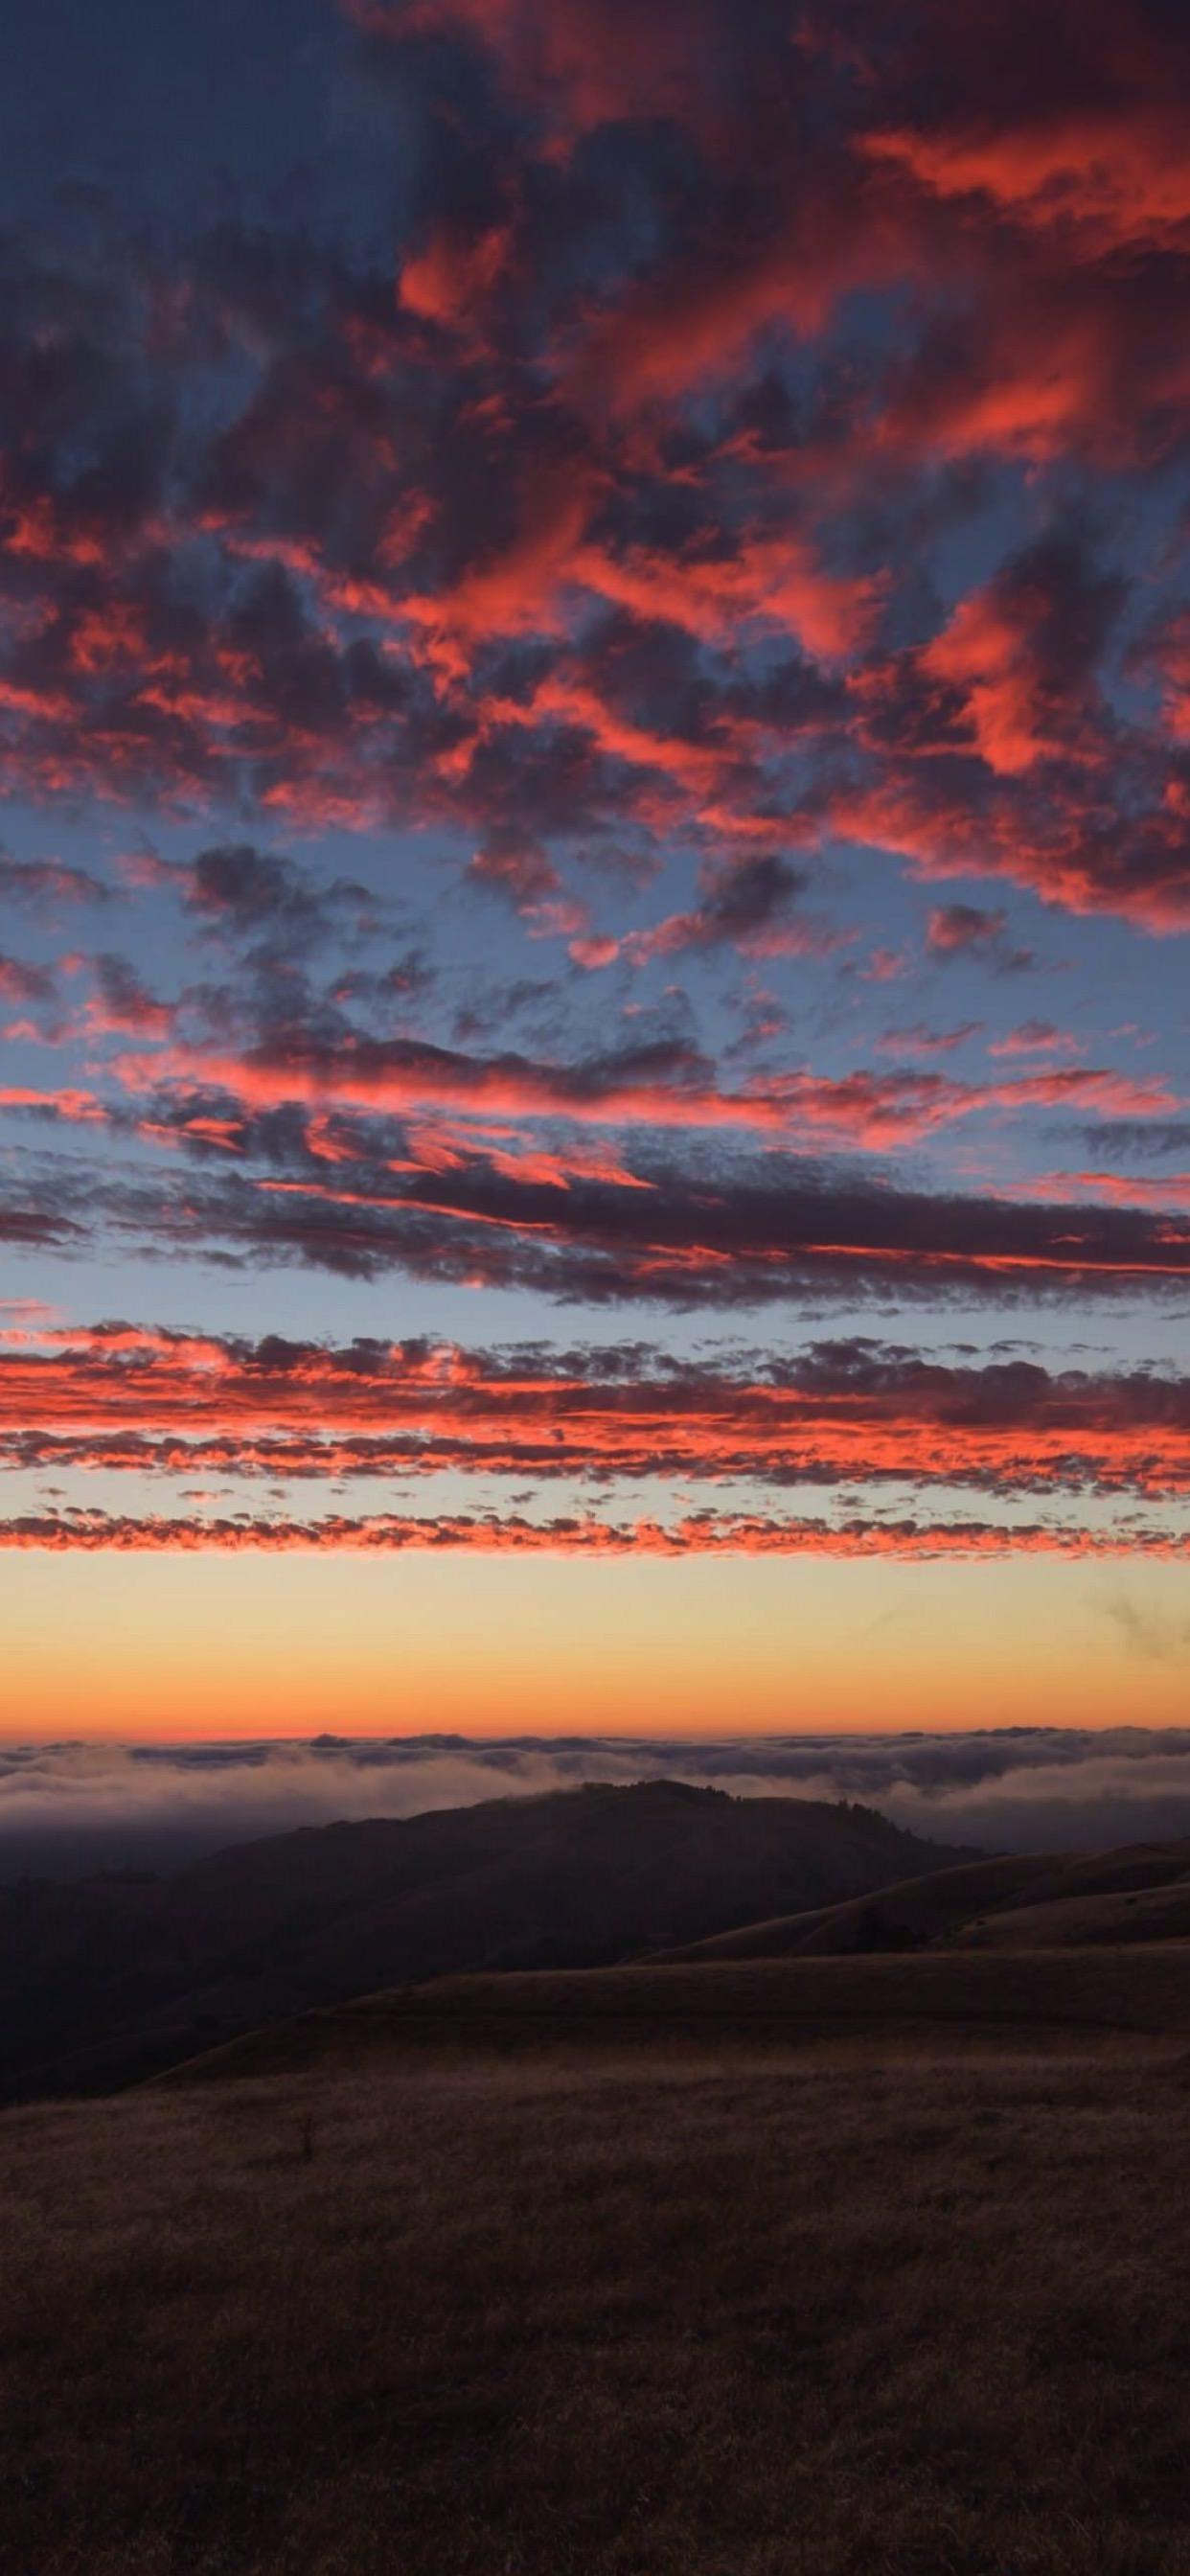 Scenery Sky Sunset Wallpaper Sc Iphone Xs Max